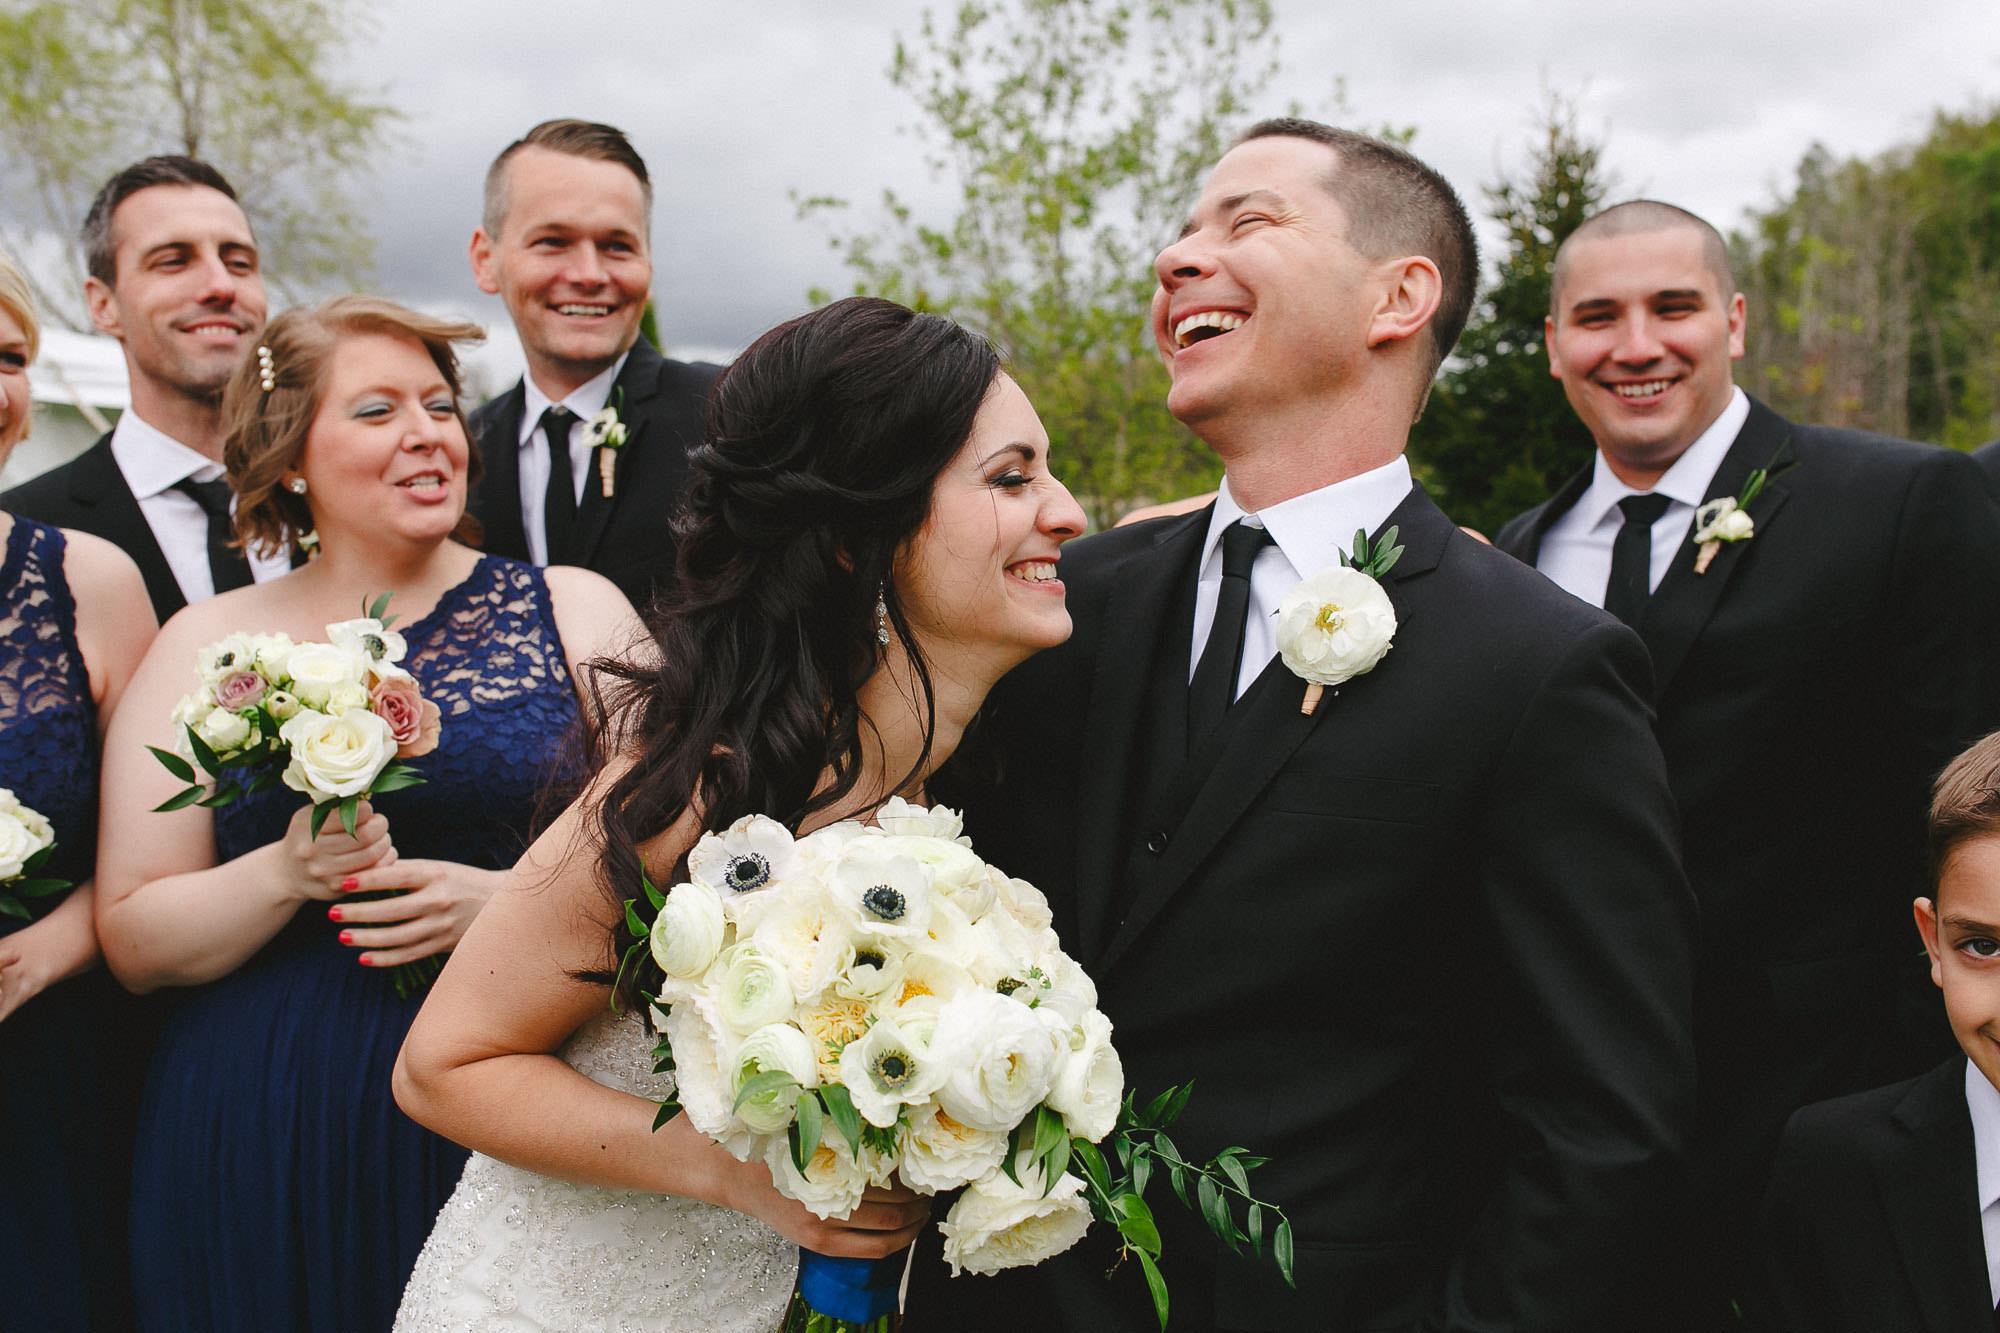 michigan-backyard-wedding051427.jpg